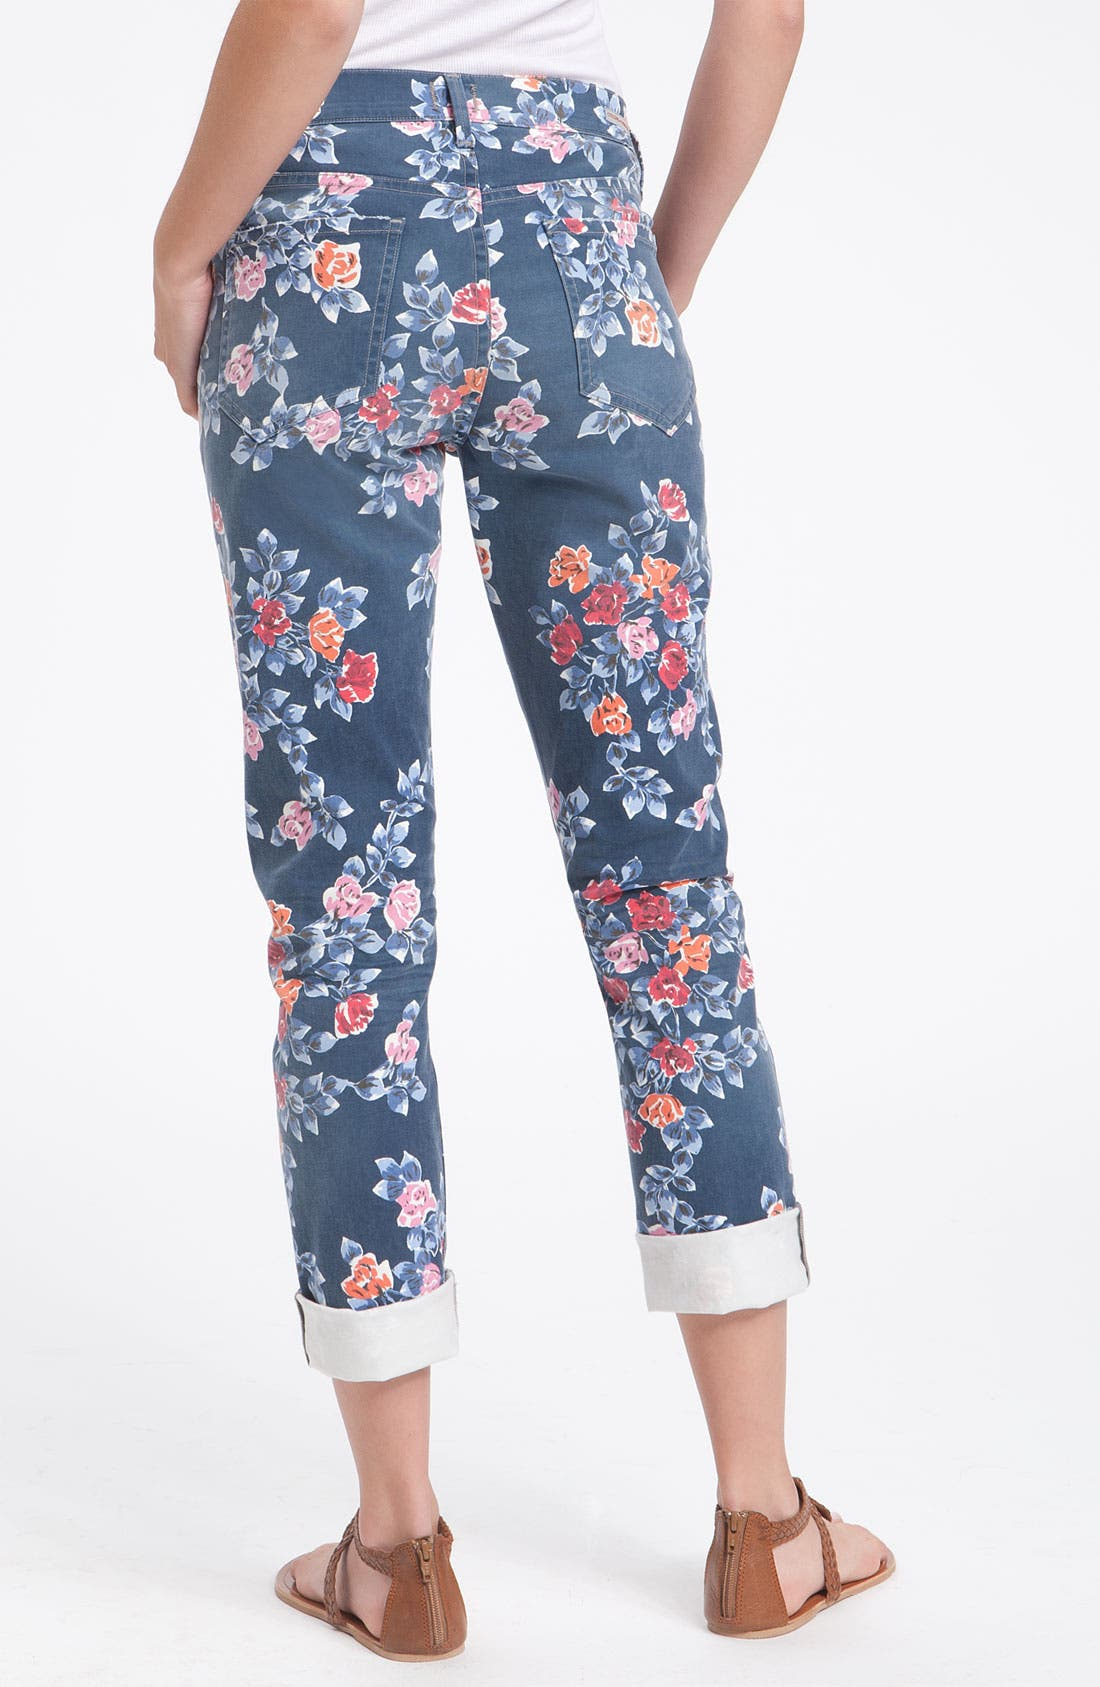 Alternate Image 1 Selected - Citizens of Humanity 'Mandy' High Waist Slim Leg Floral Print Jeans (Navy Petite Rose)